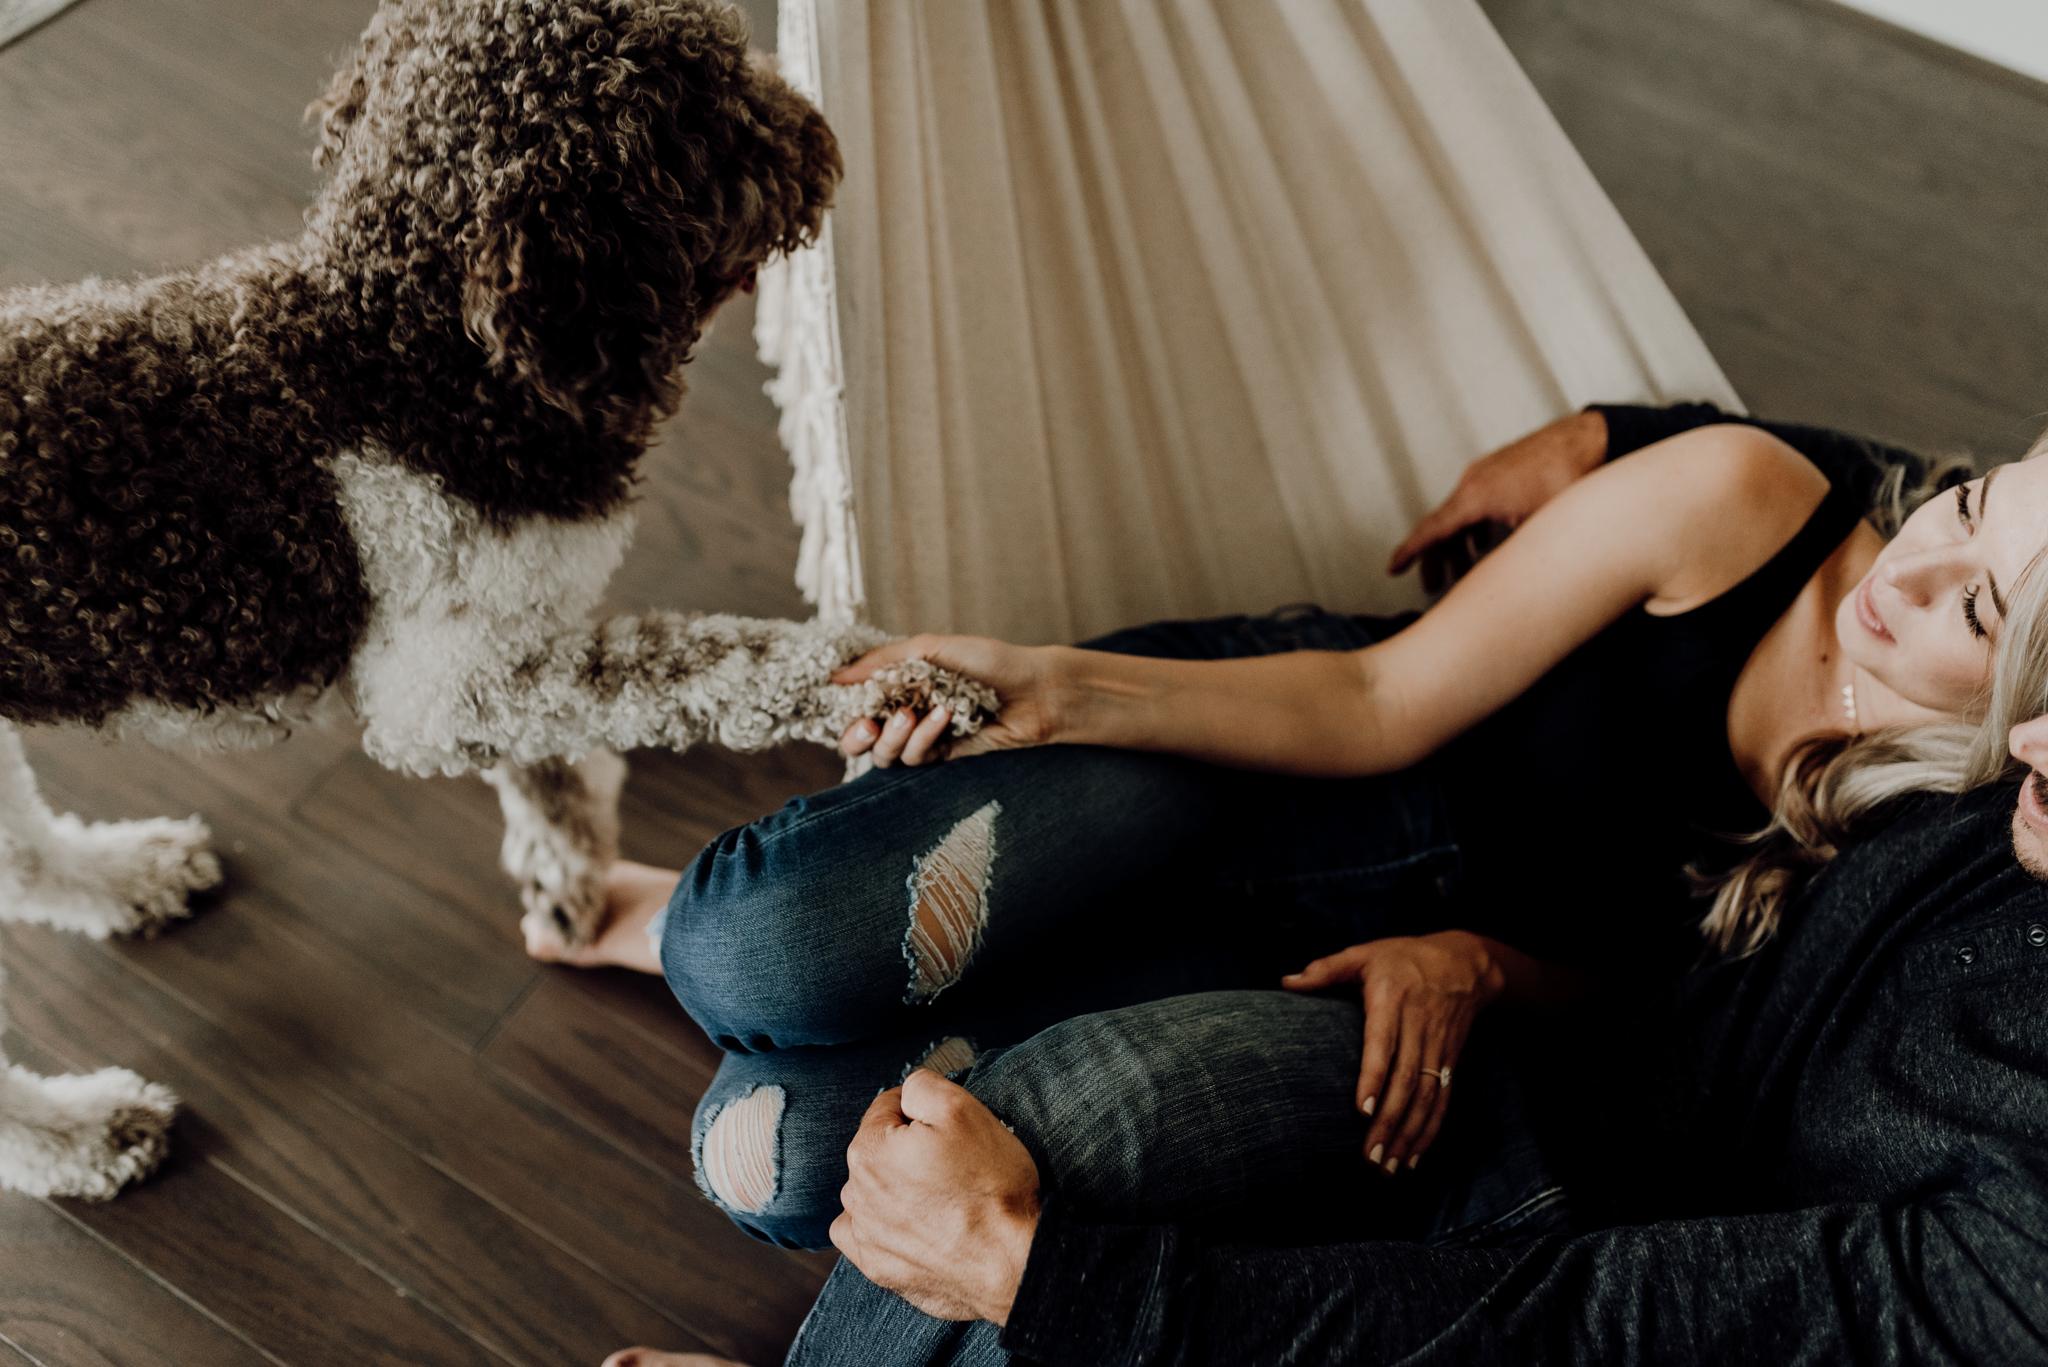 Houston Wedding Photographer-Houston In Home Engagement Session- Houston Wedding Photographer -Kristen Giles Photography-61.jpg